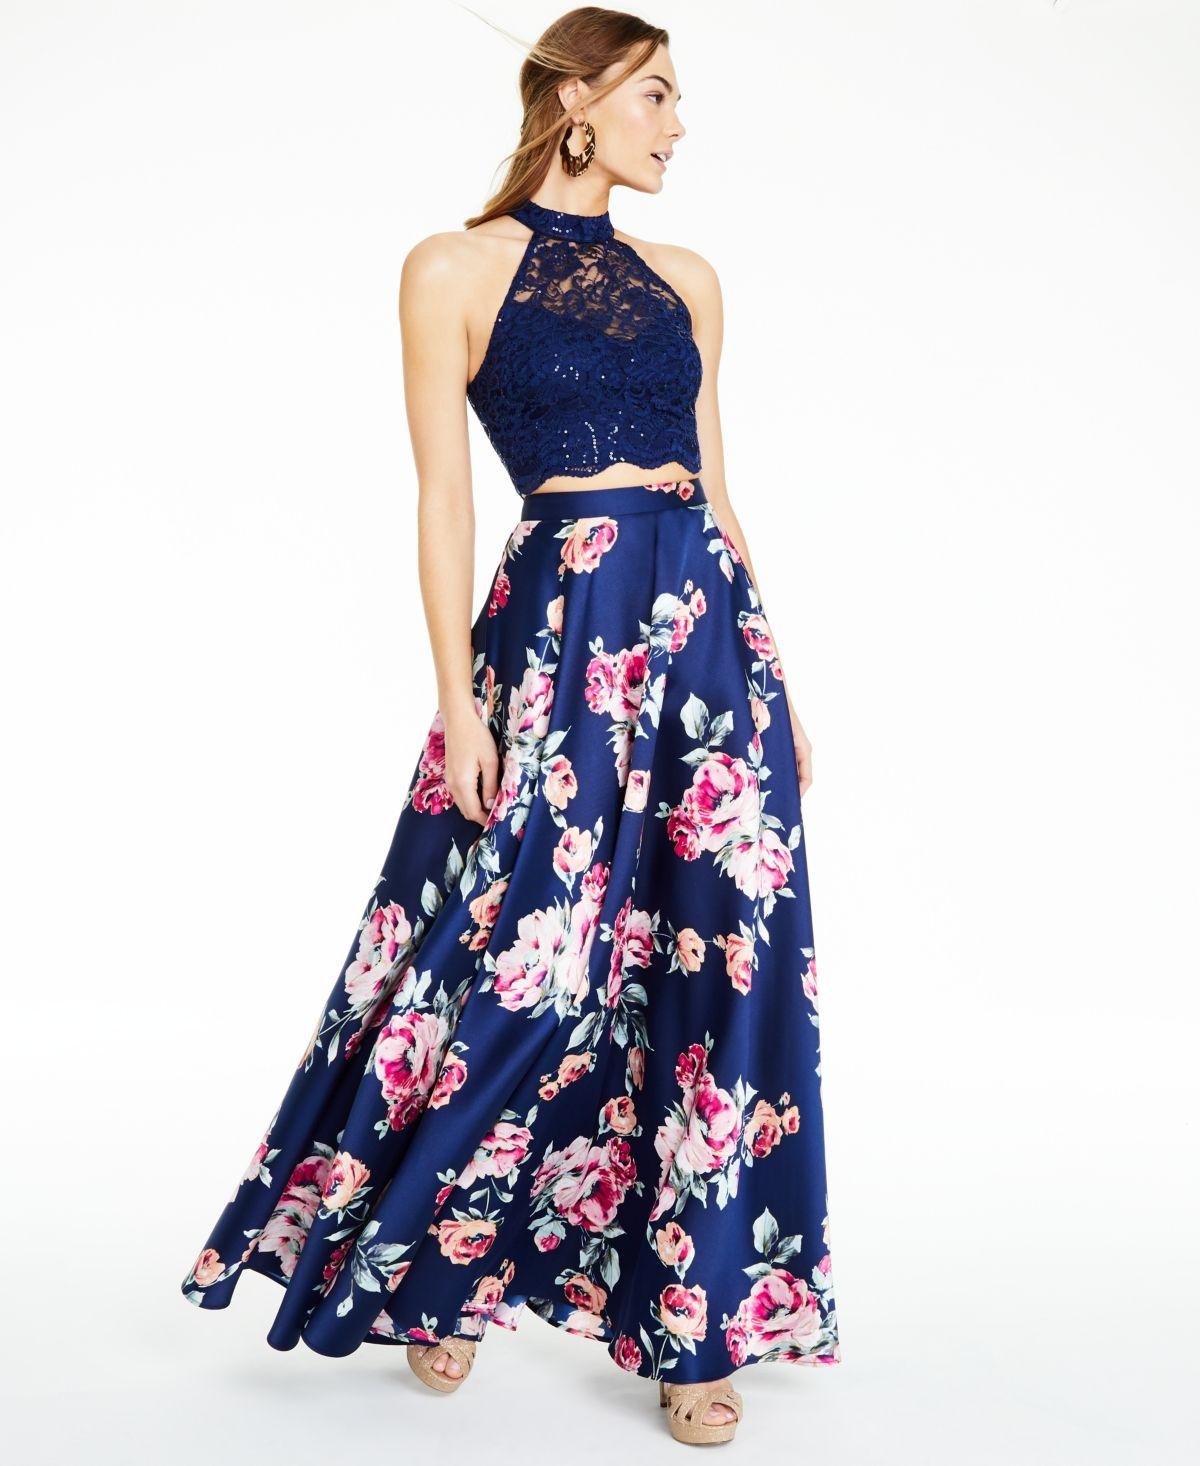 City Studios Juniors Lace Top And Floral 2 Pc Gown Navy Pink Floral Print Maxi Skirt Junior Dresses Review Dresses [ 1466 x 1200 Pixel ]